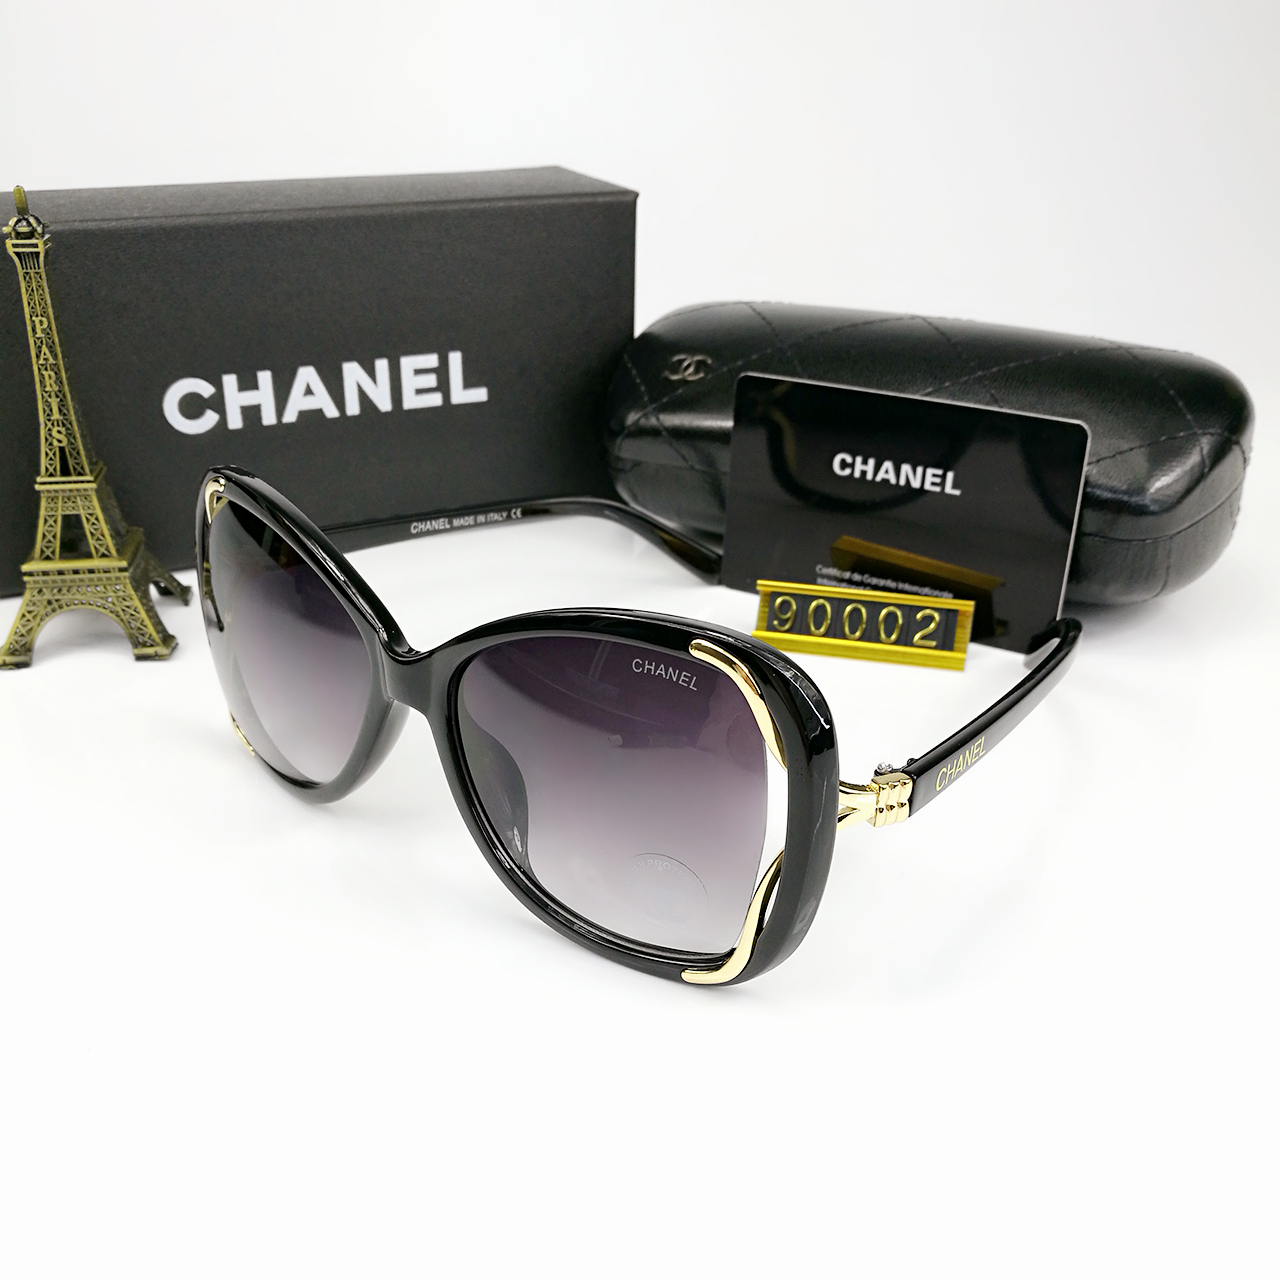 Chanel Eyeglass Frames Replica : USD16 cheap Chanel Sunglasses #275579 - [GT275579] free ...